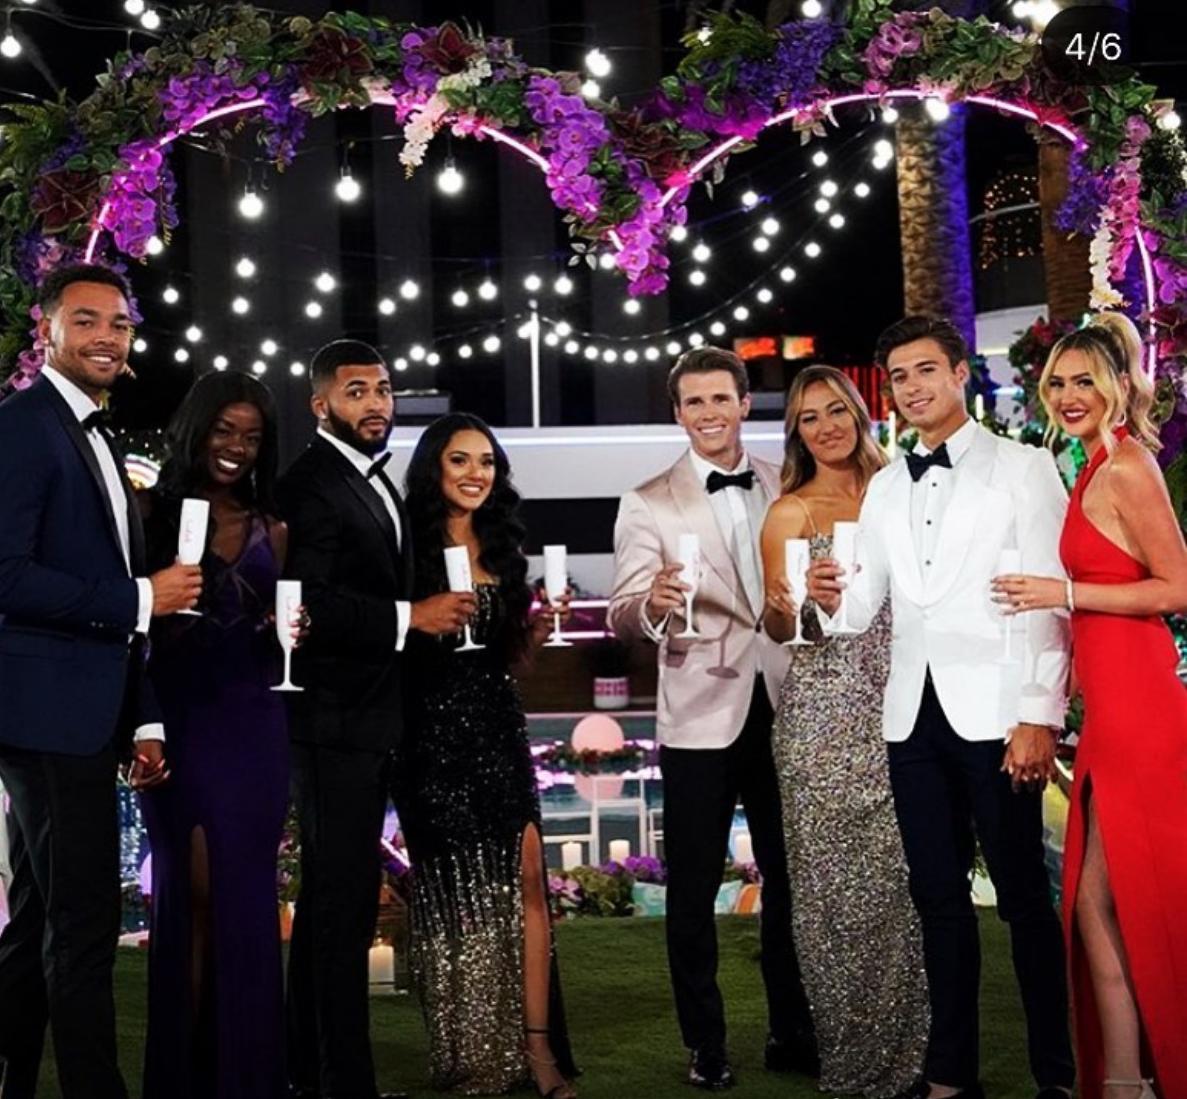 Four men and four women in black tie attire hold Champagne glasses